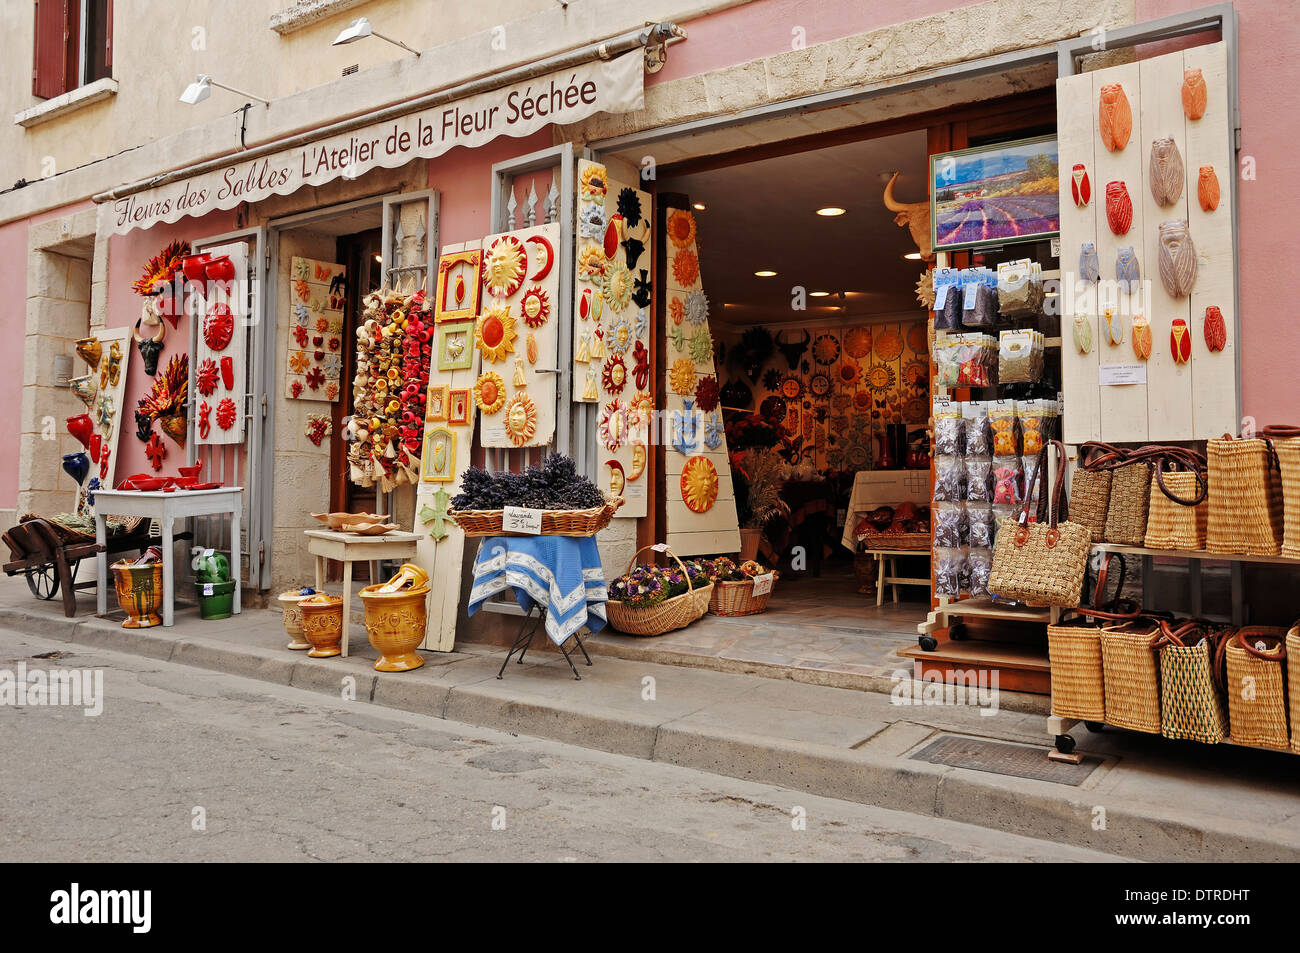 Shop, Aigues-Mortes, Camargue, Gard, Languedoc-Roussillon, Southern France - Stock Image